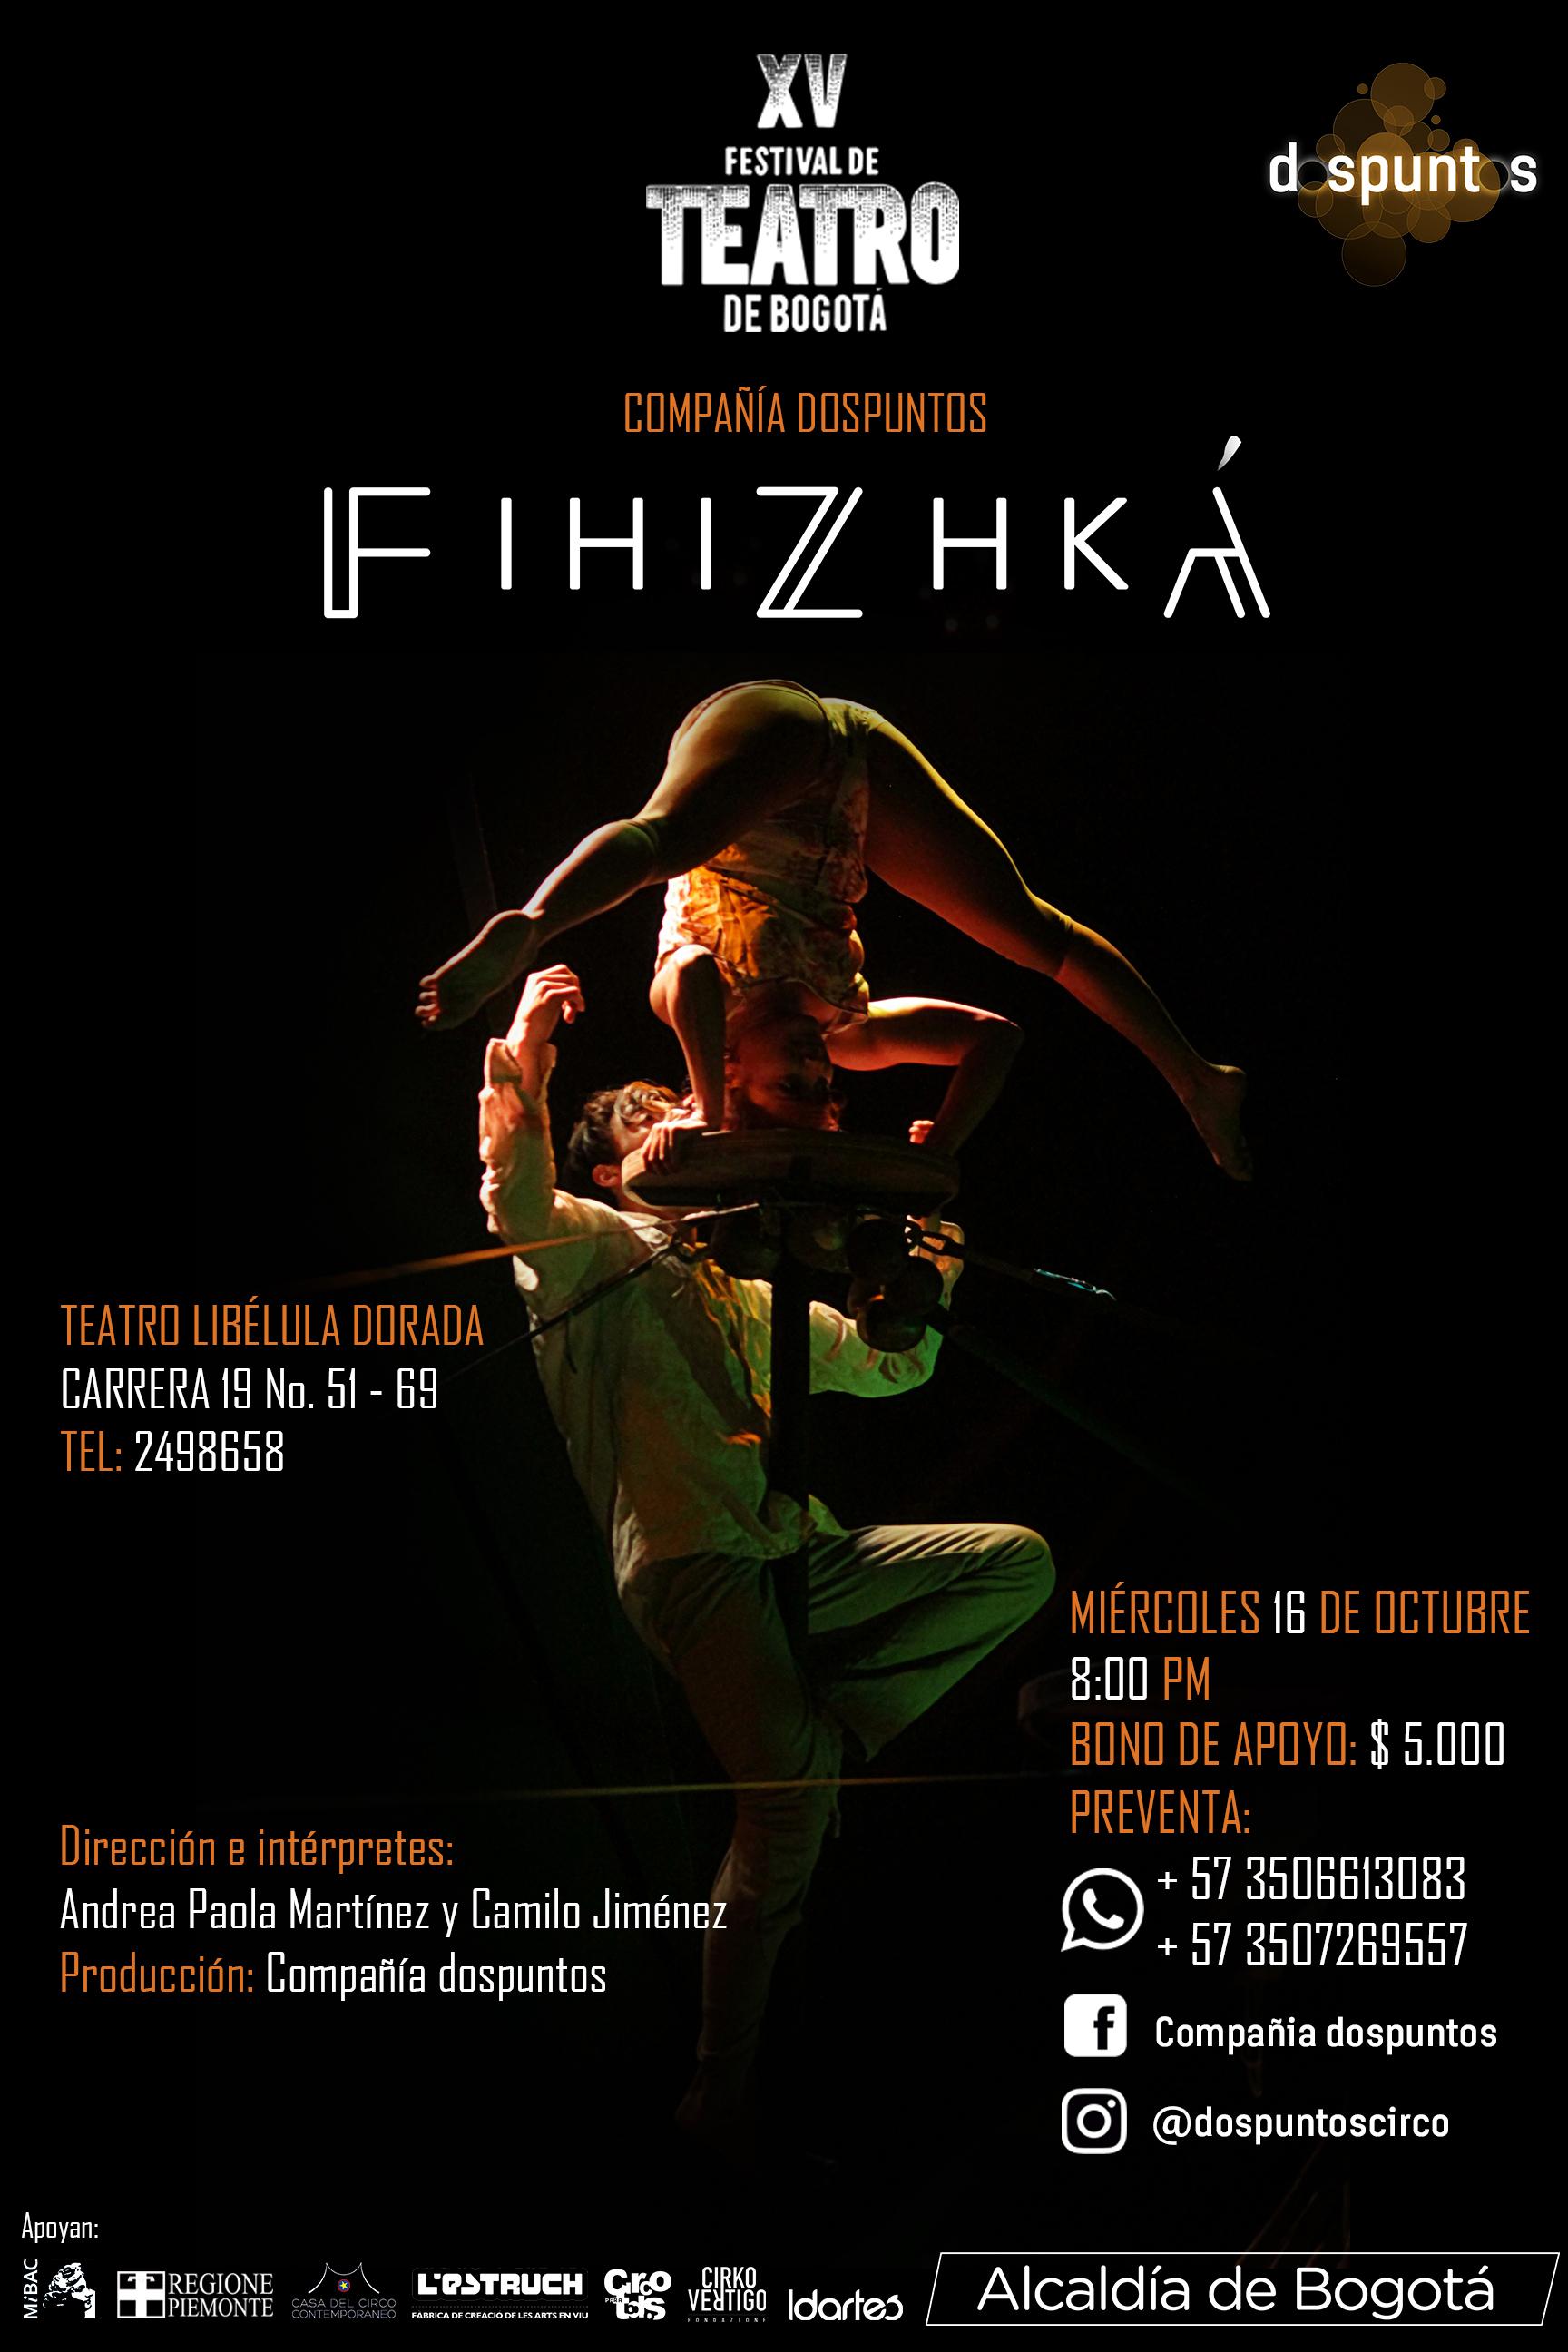 Festival teatro de Bogotá